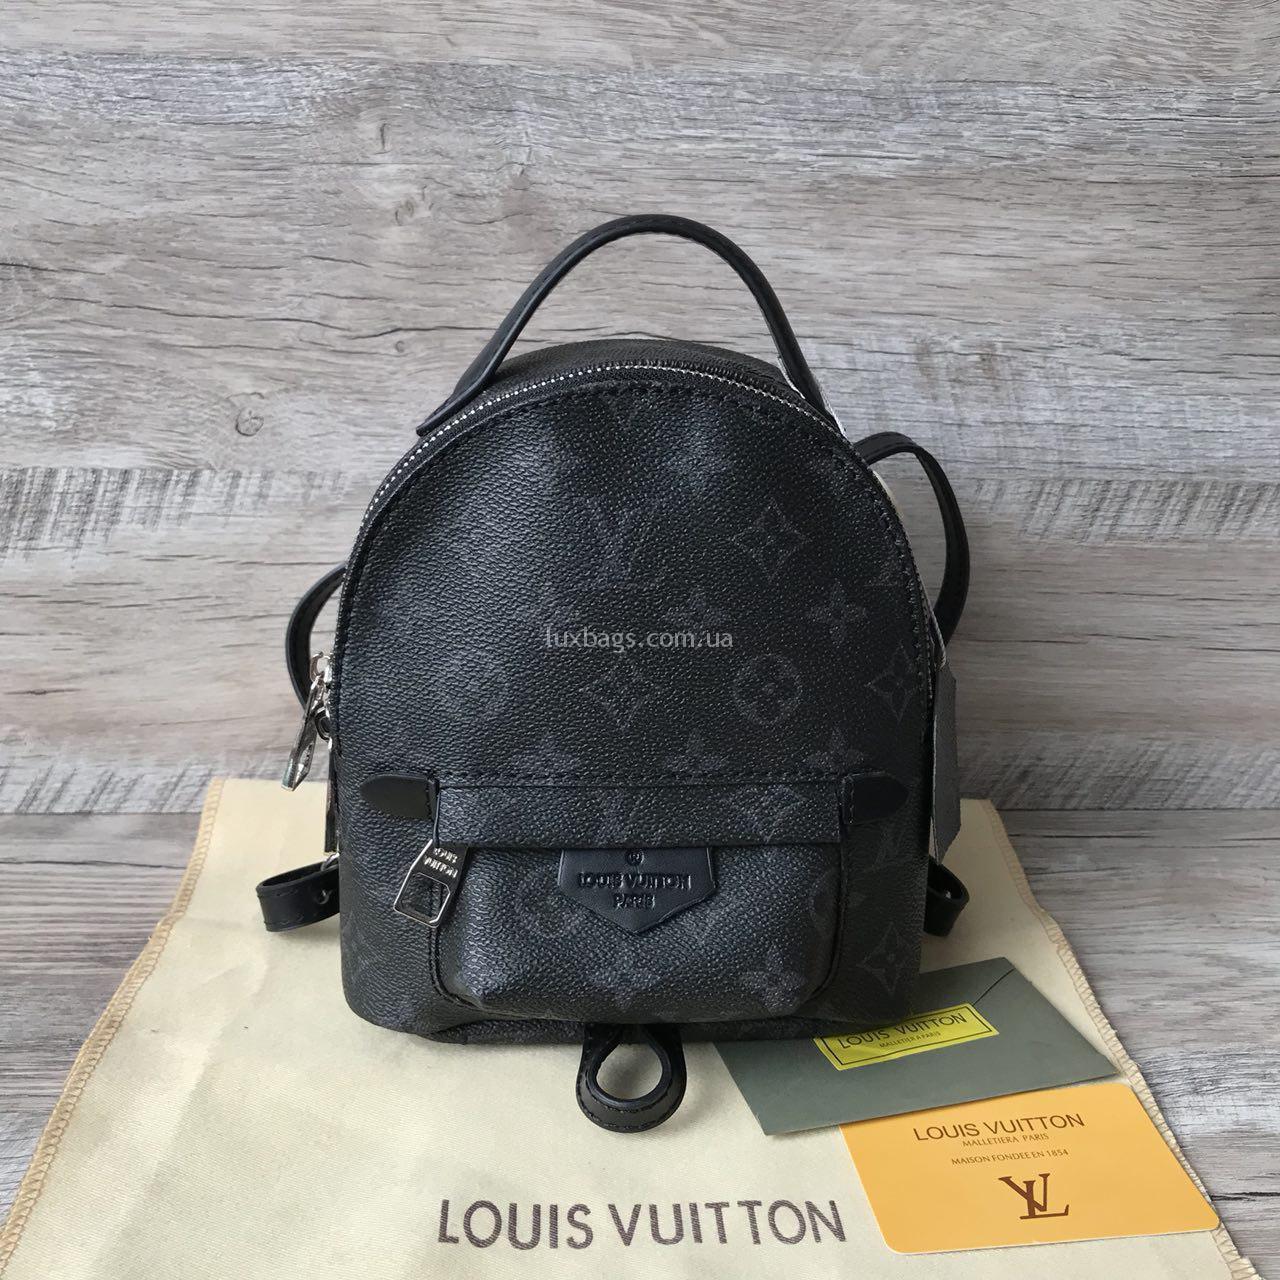 f3557ac58864 Женский мини рюкзак Louis Vuitton Луи Виттон Купить на lux-bags